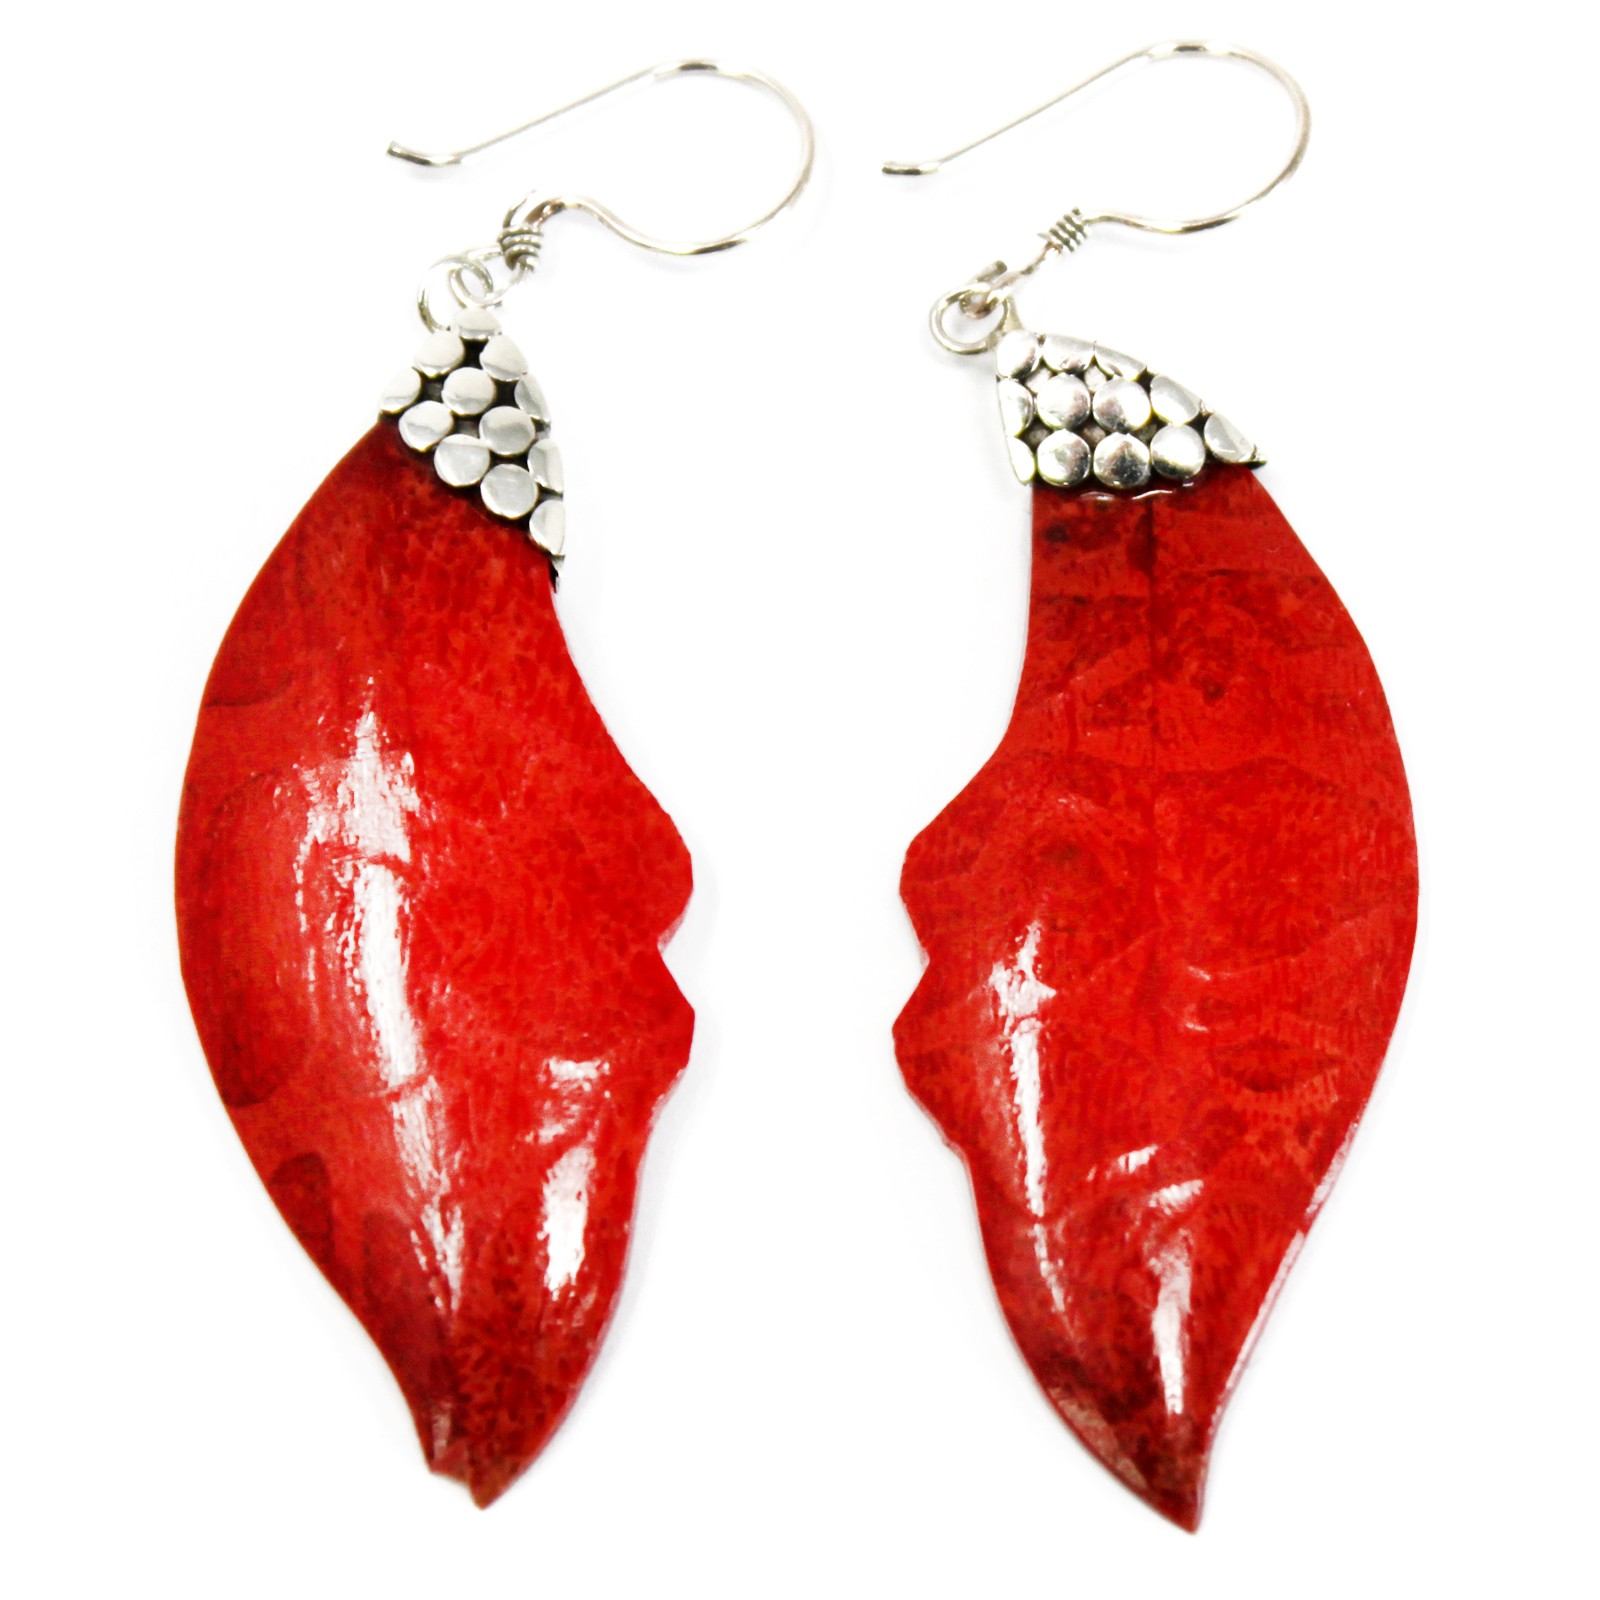 Coral Style Silver Earrings Leaf Drop